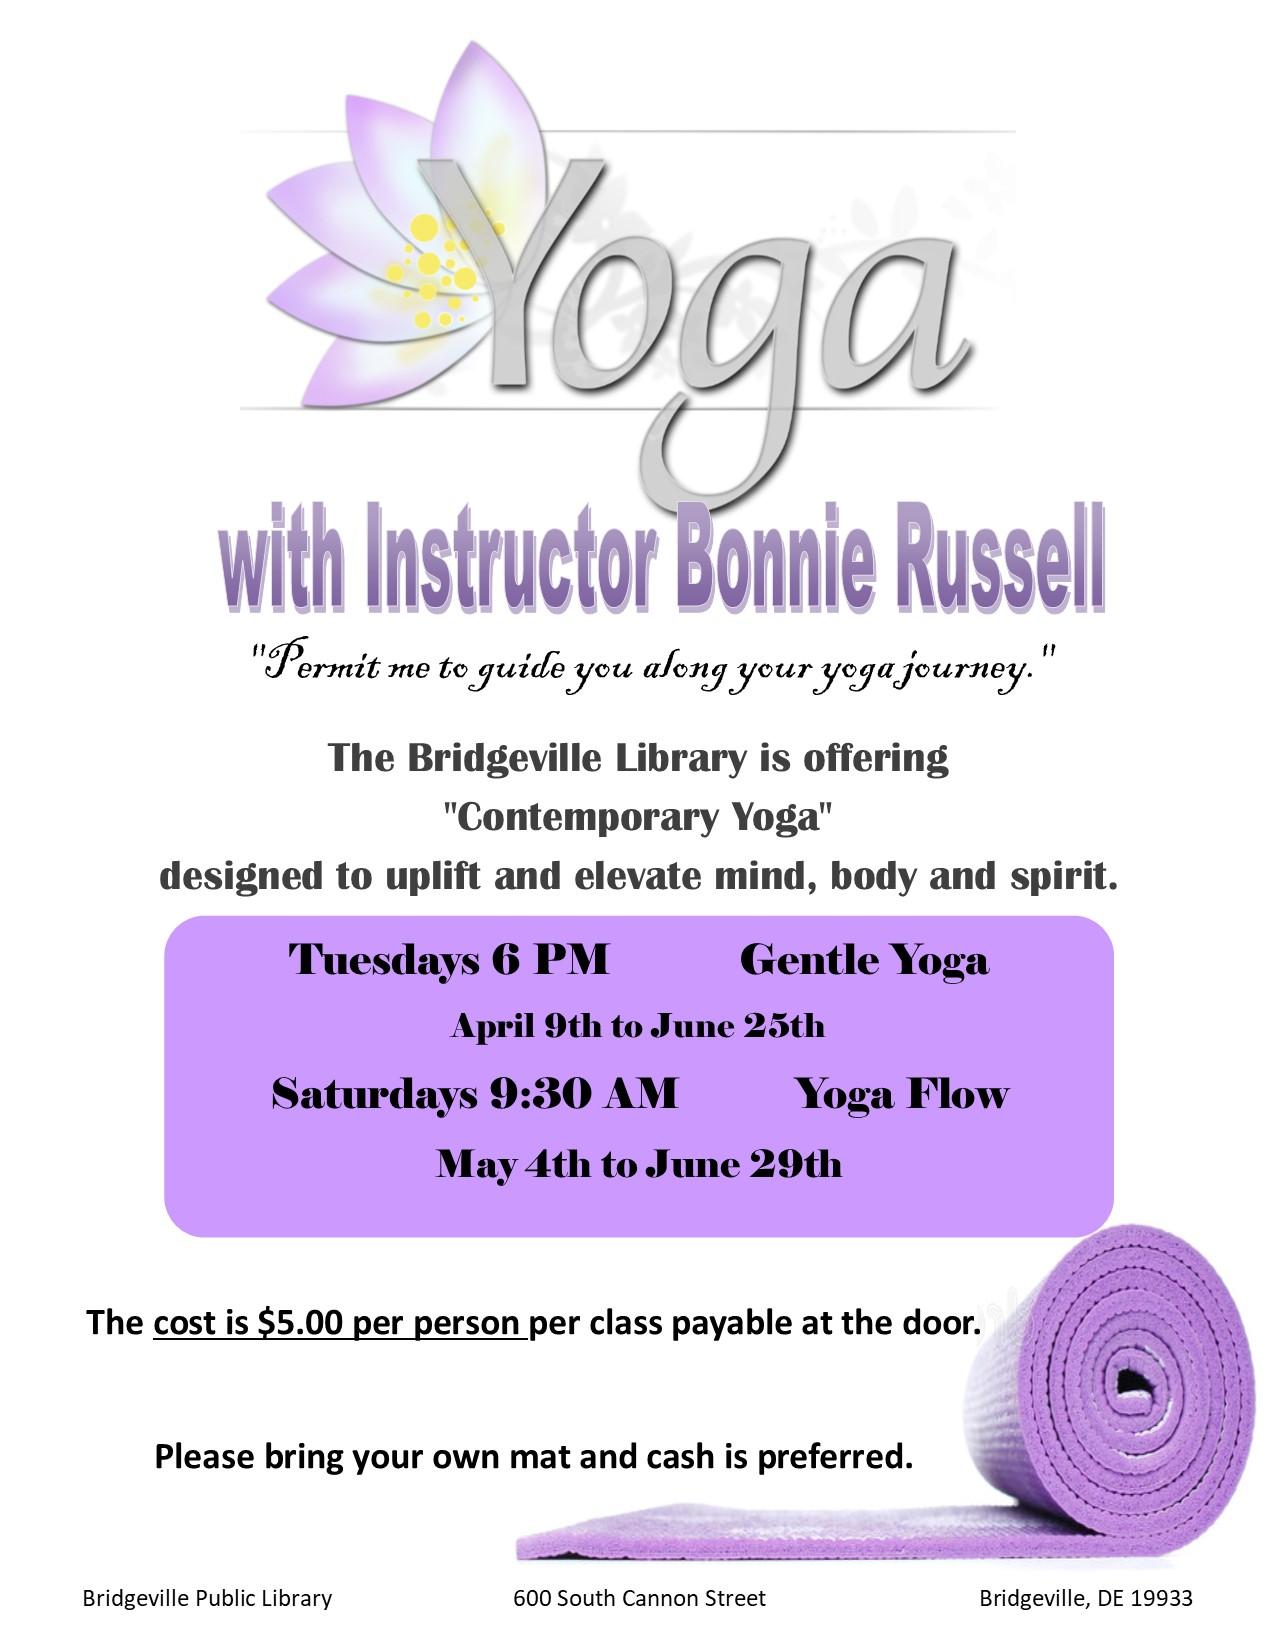 Yoga Flow with Bonnie